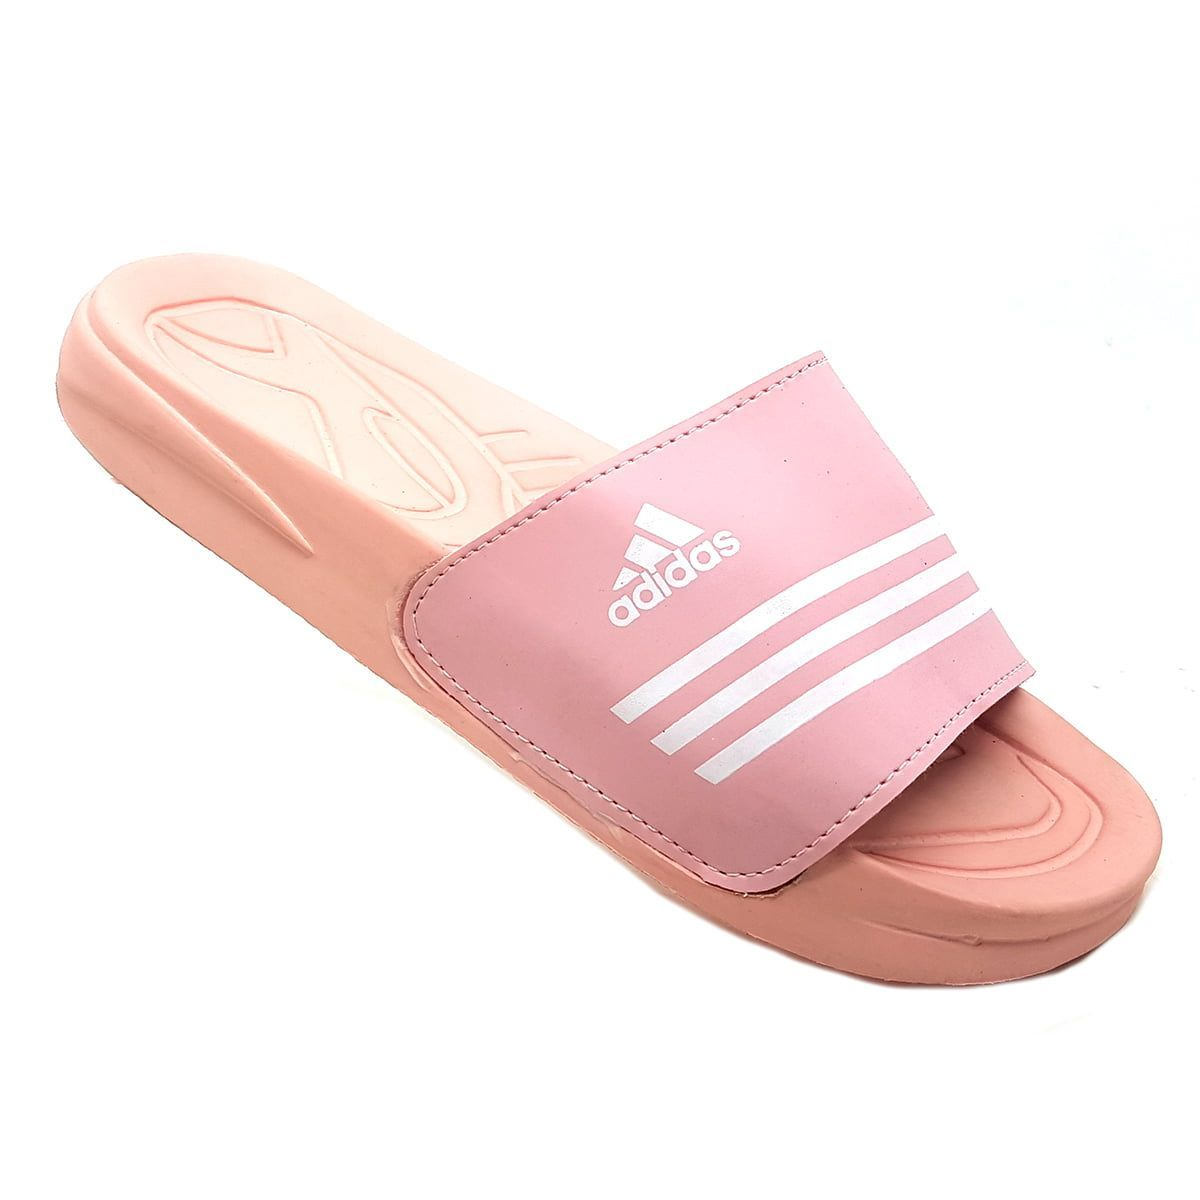 Leonardoda par Espectacular  Chinelo Slide Adidas Feminino Rosa | Sandália Feminina Adidas Nunca Usado  44183228 | enjoei